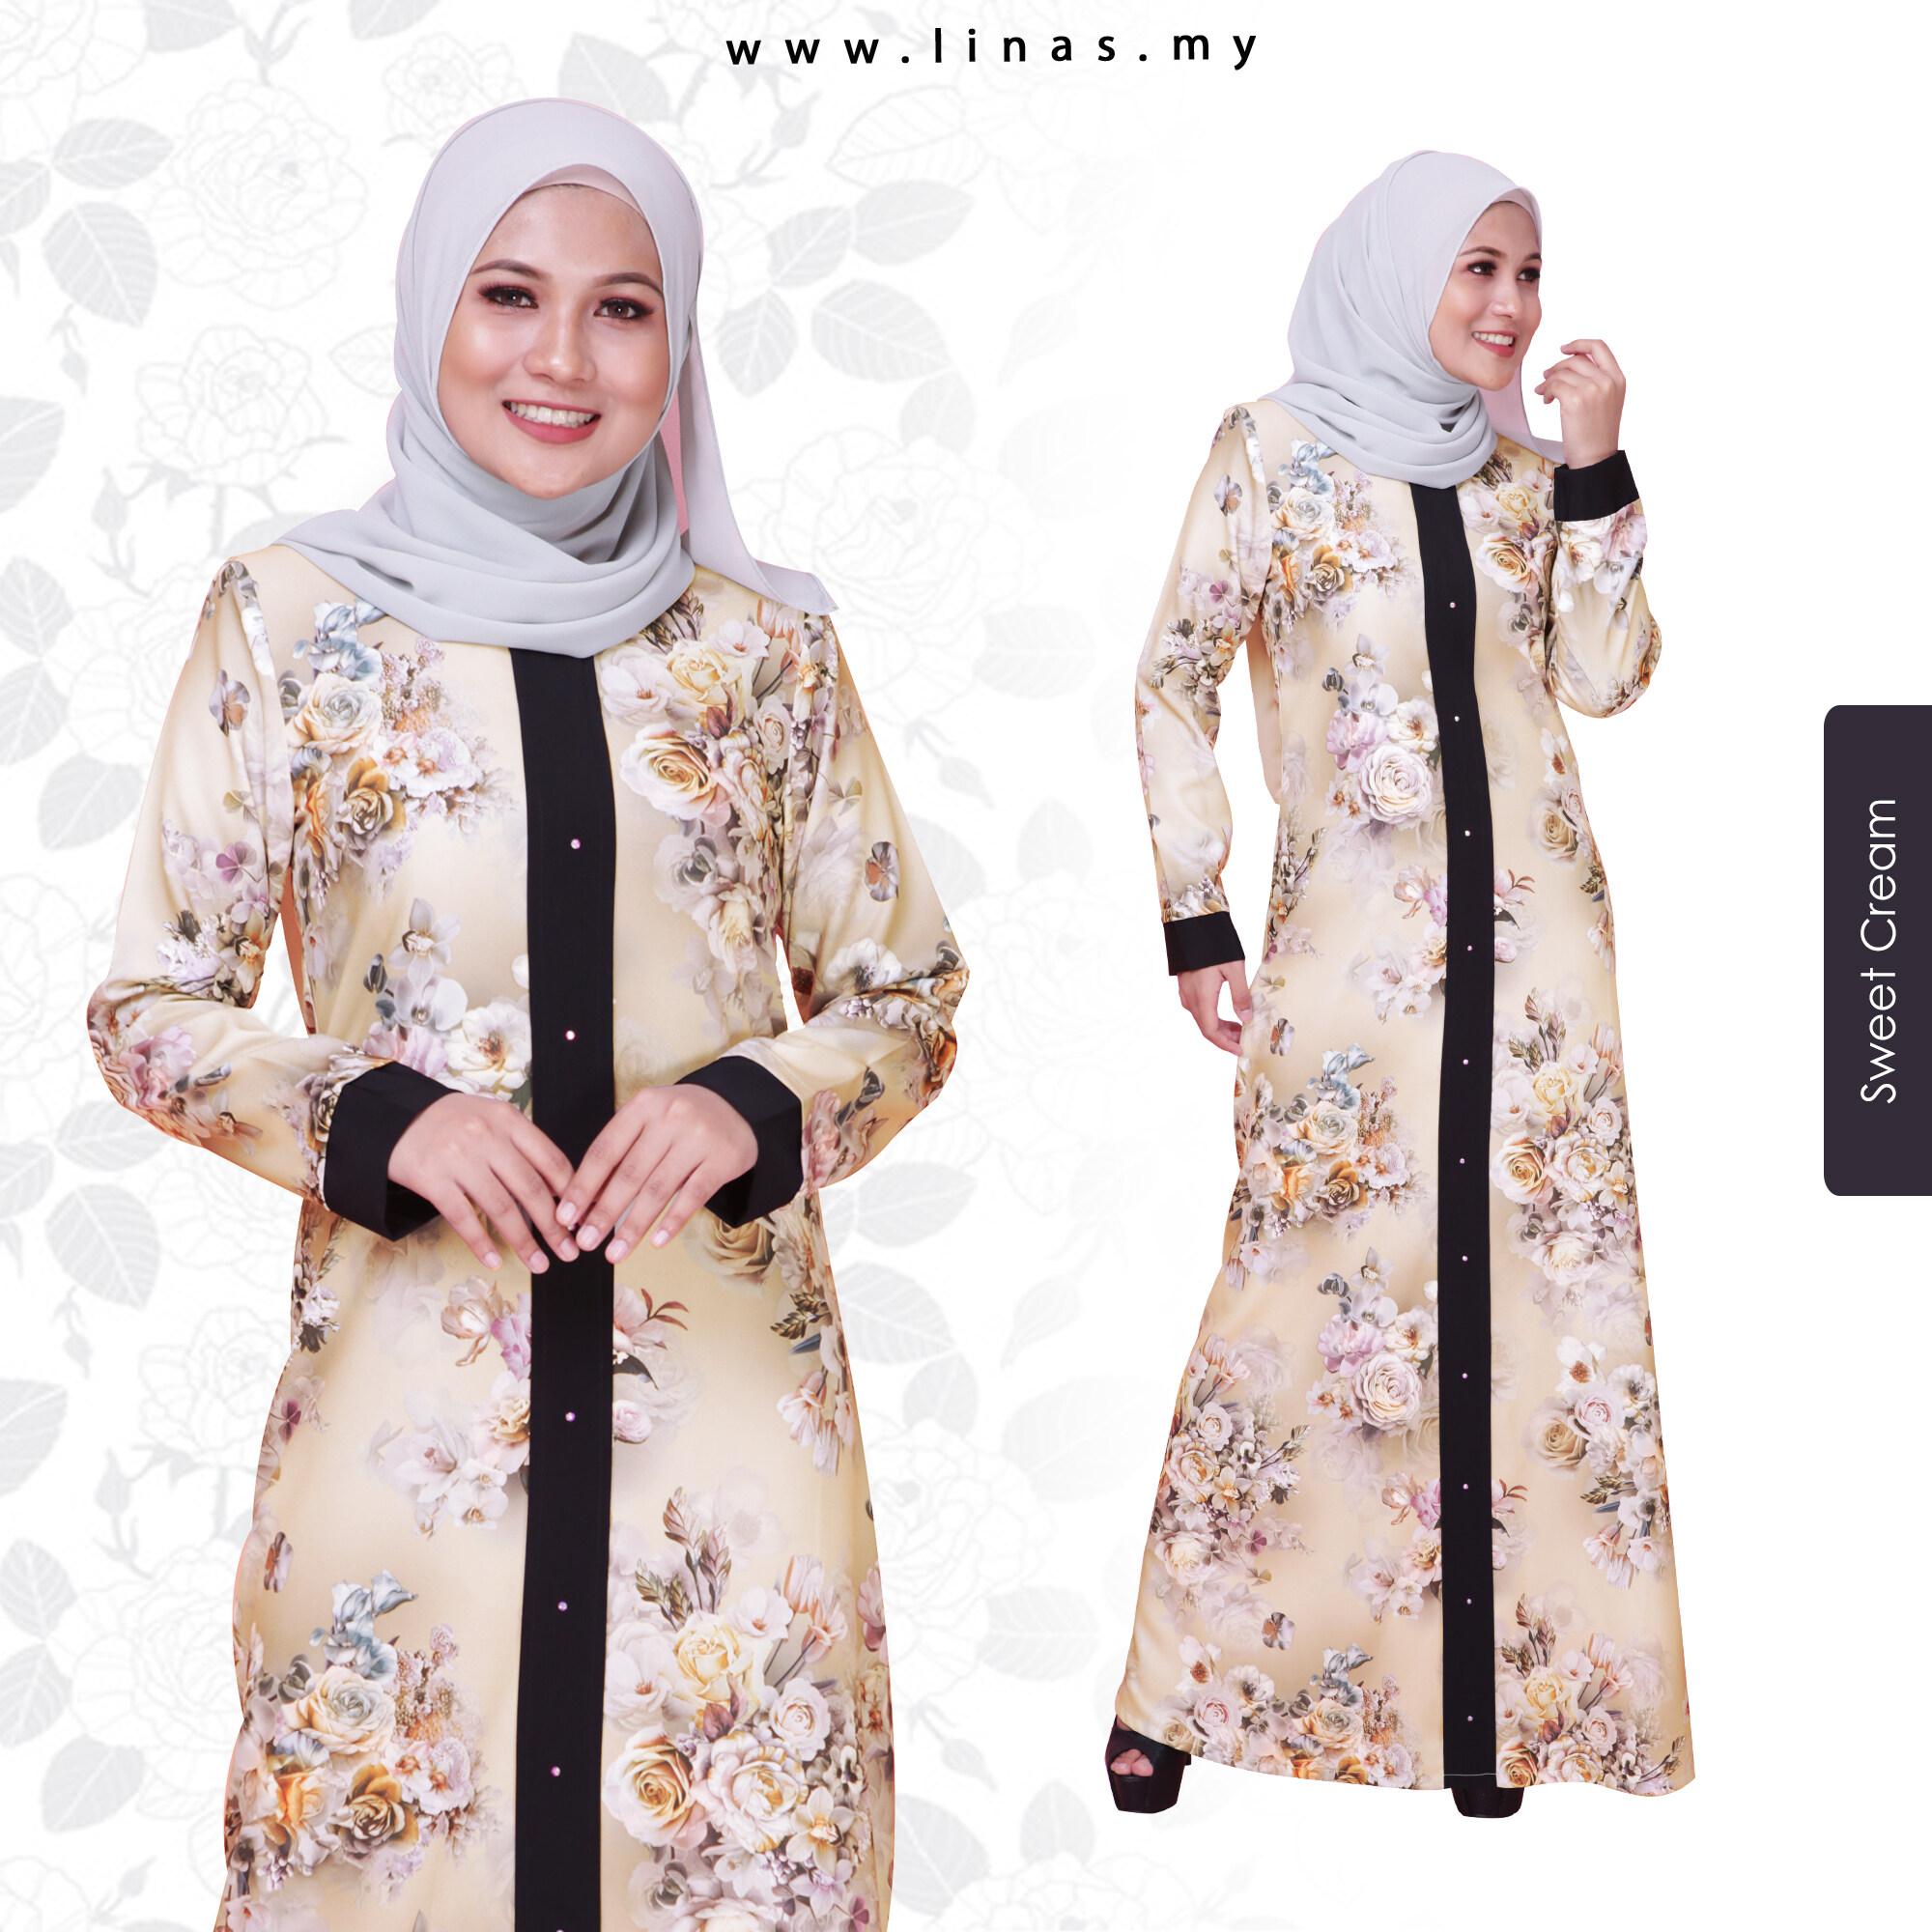 JUBAH MIQAILA EXCLUSIVE / LONG DRESS / FLORAL JUBAH ELEGANT LOOK